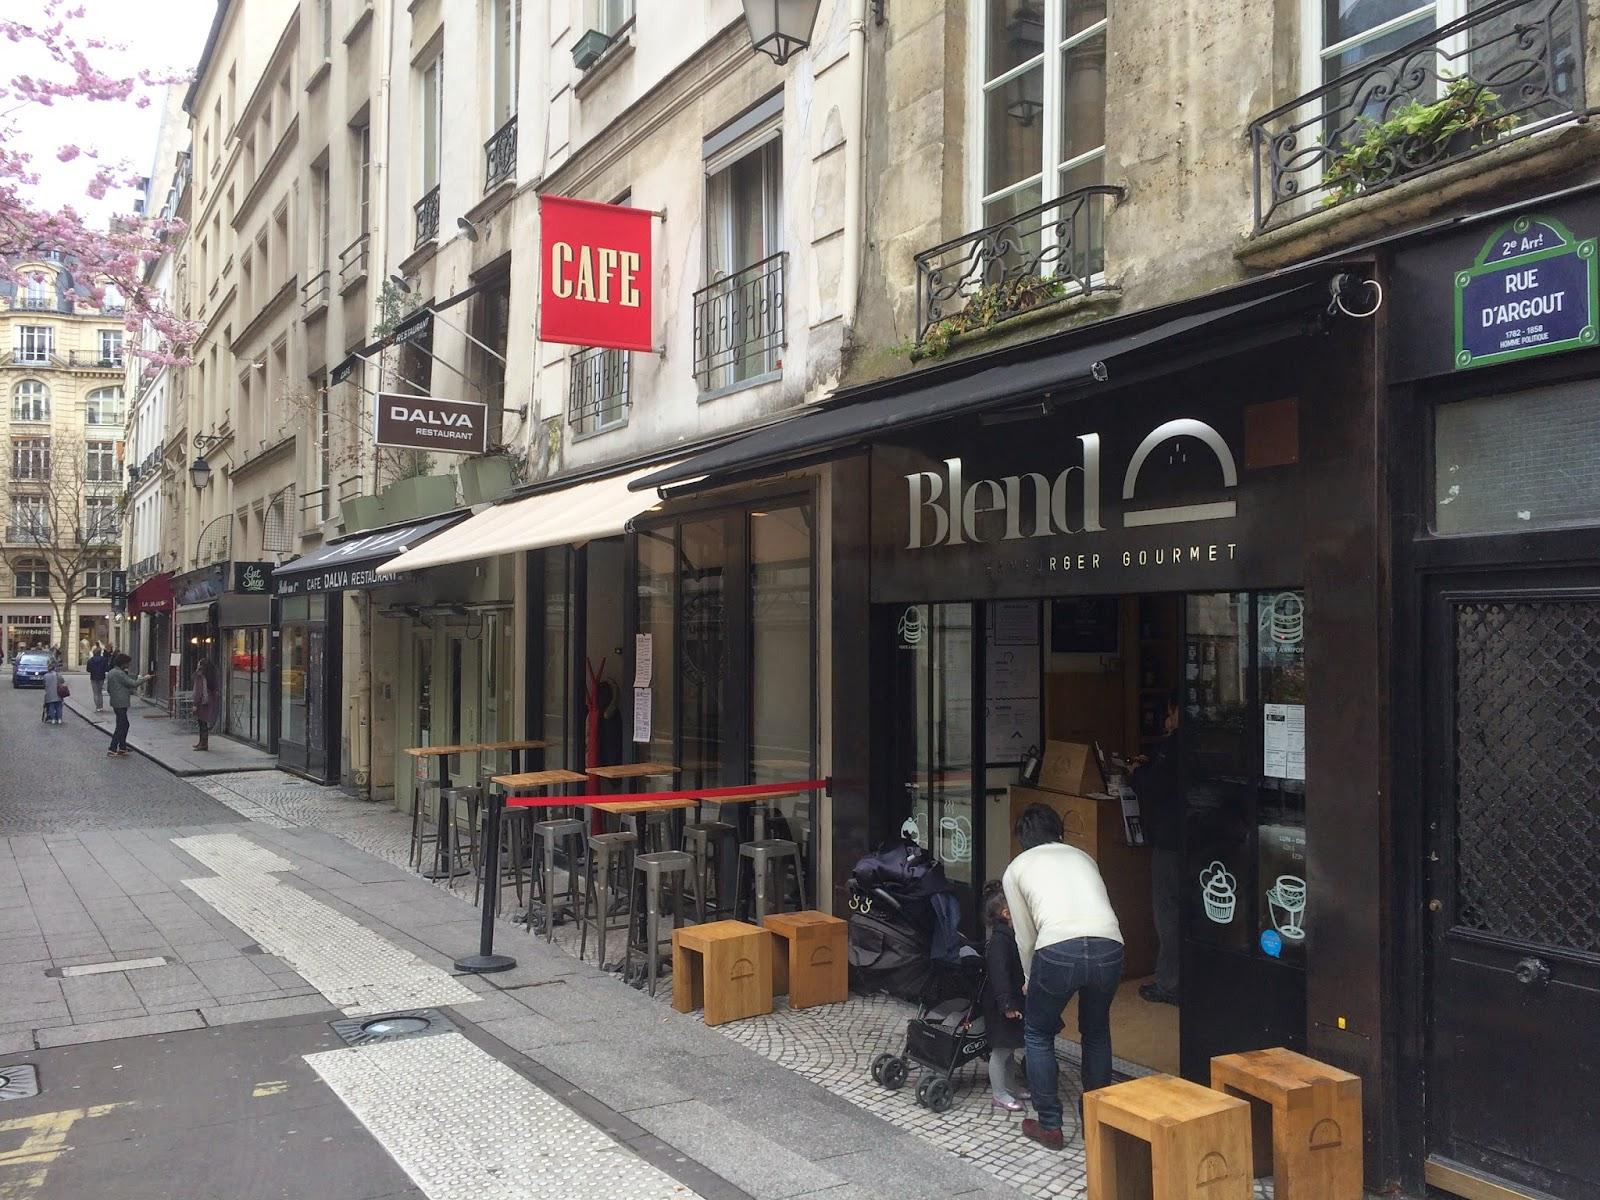 Exterior of Blend, rue d'Argout, Paris